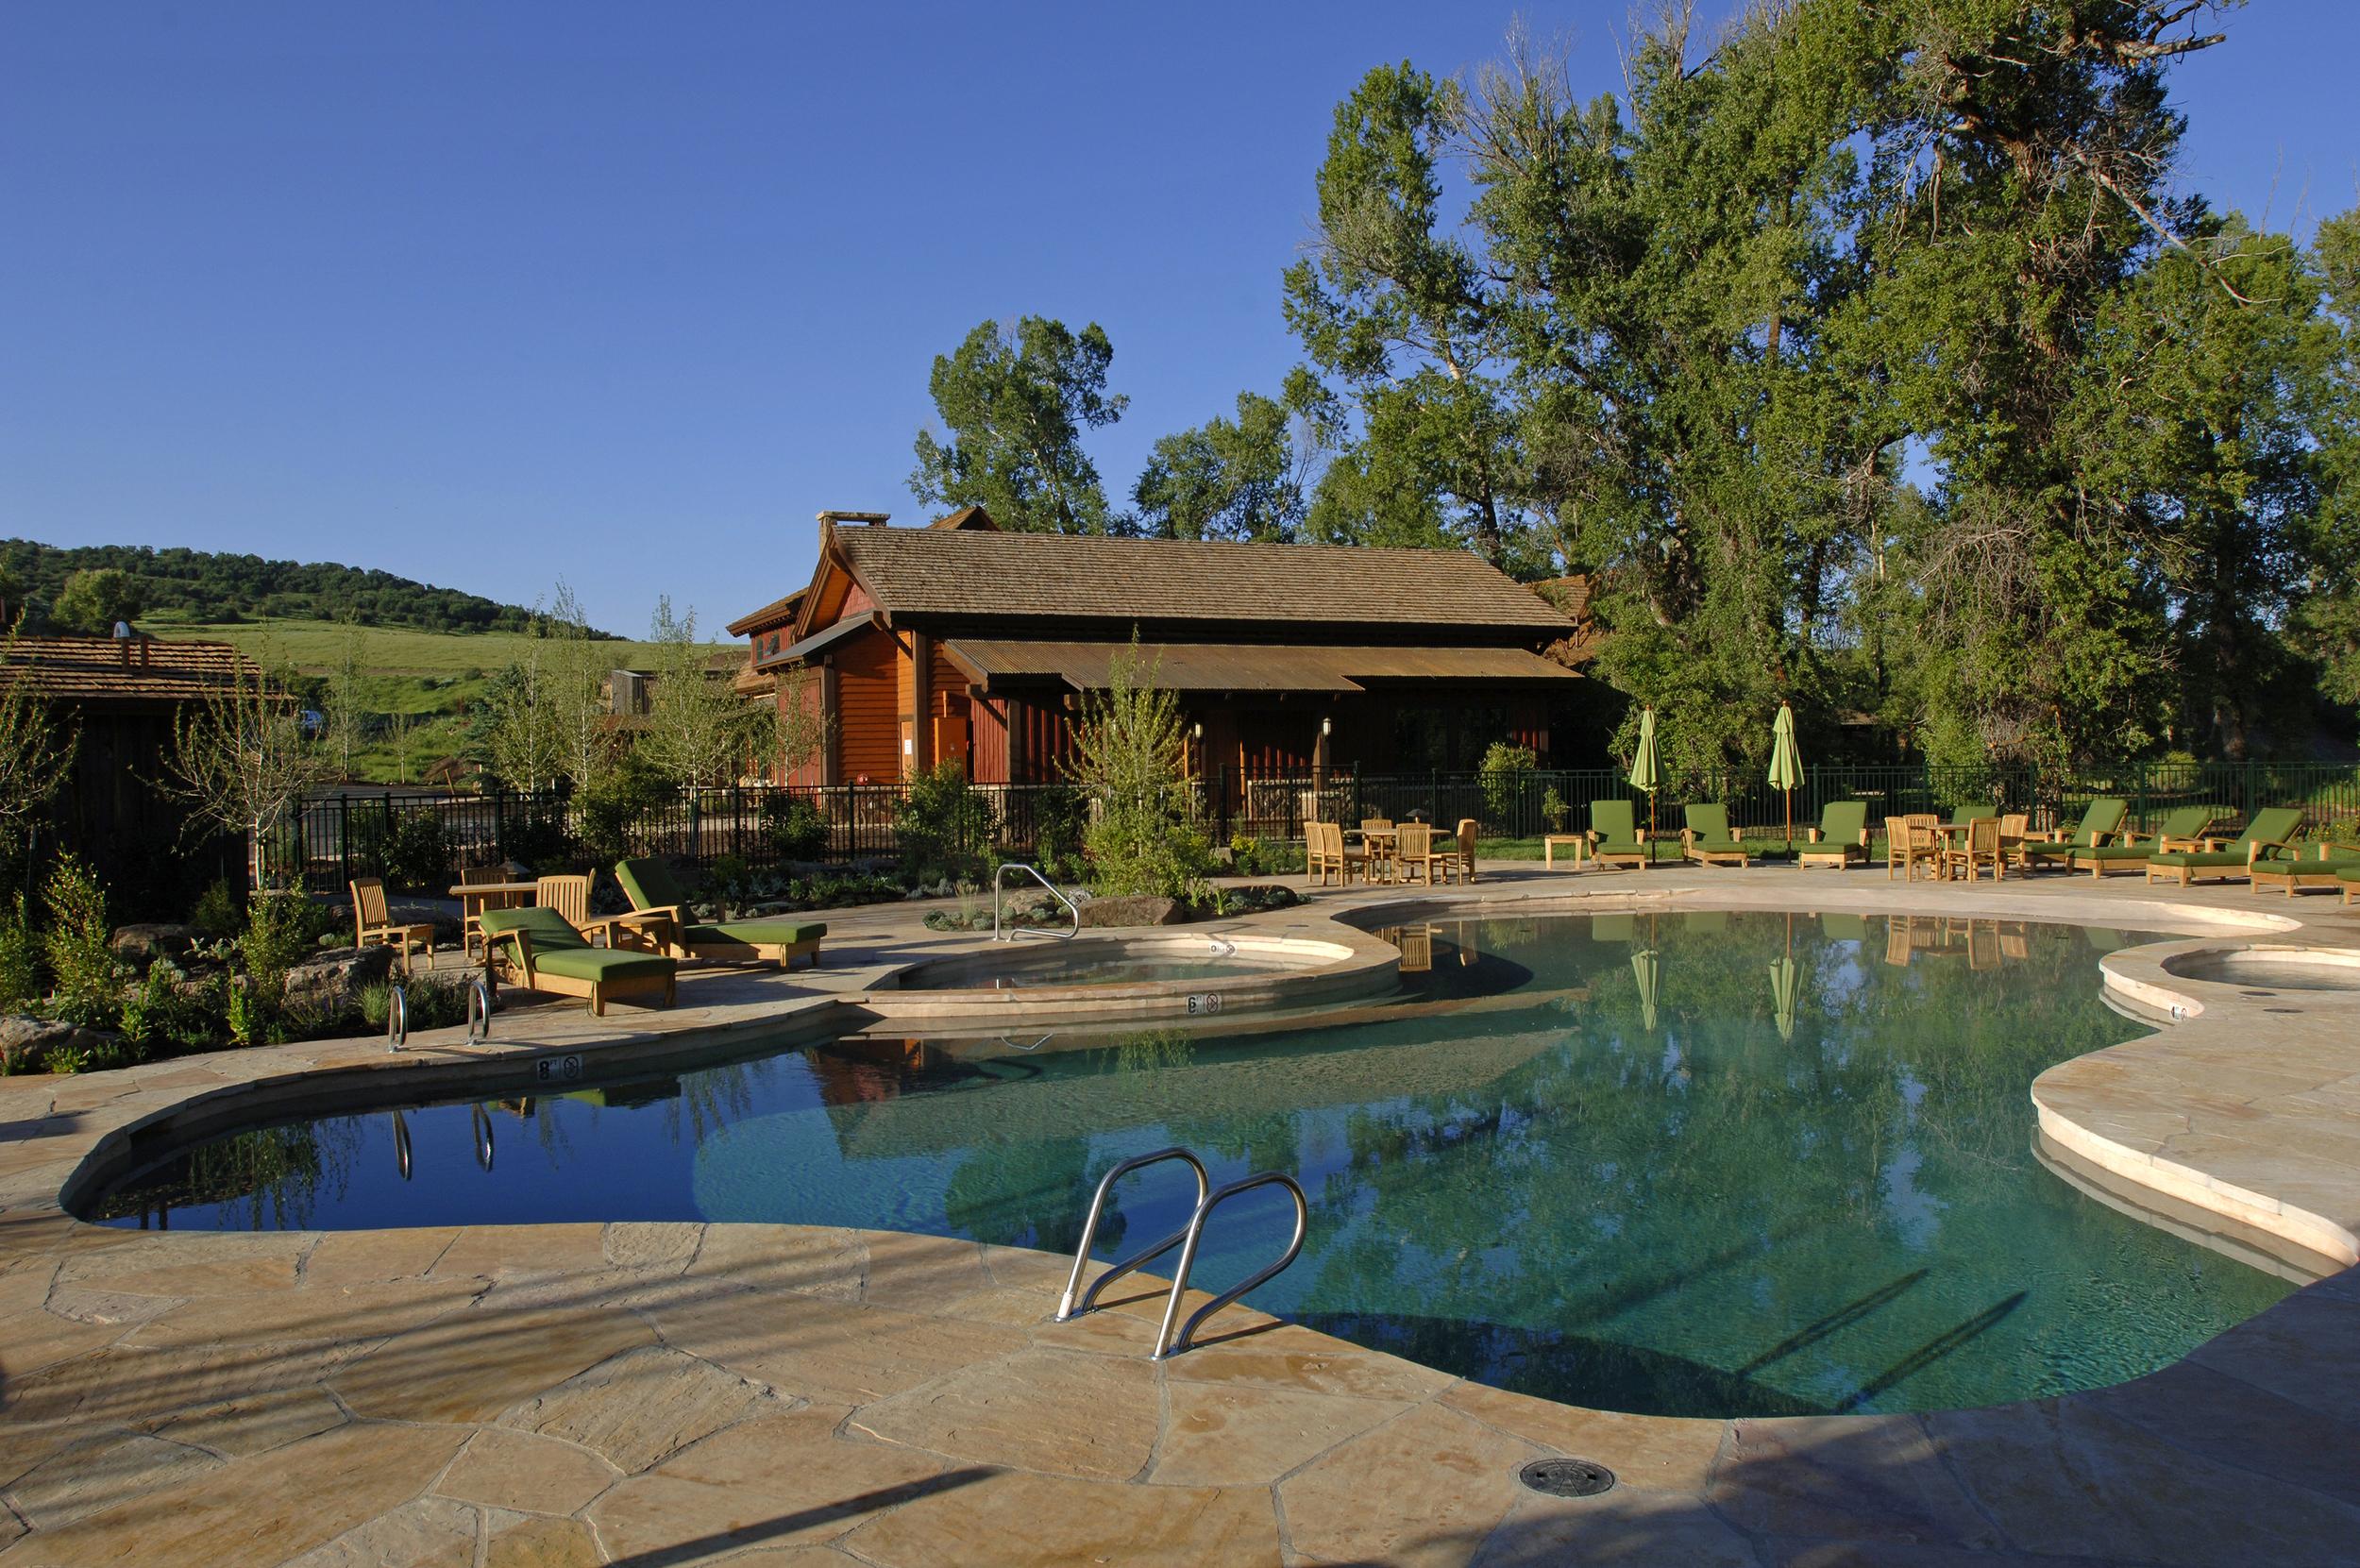 marabou_ranch_steamboat_colorado_pool.jpg